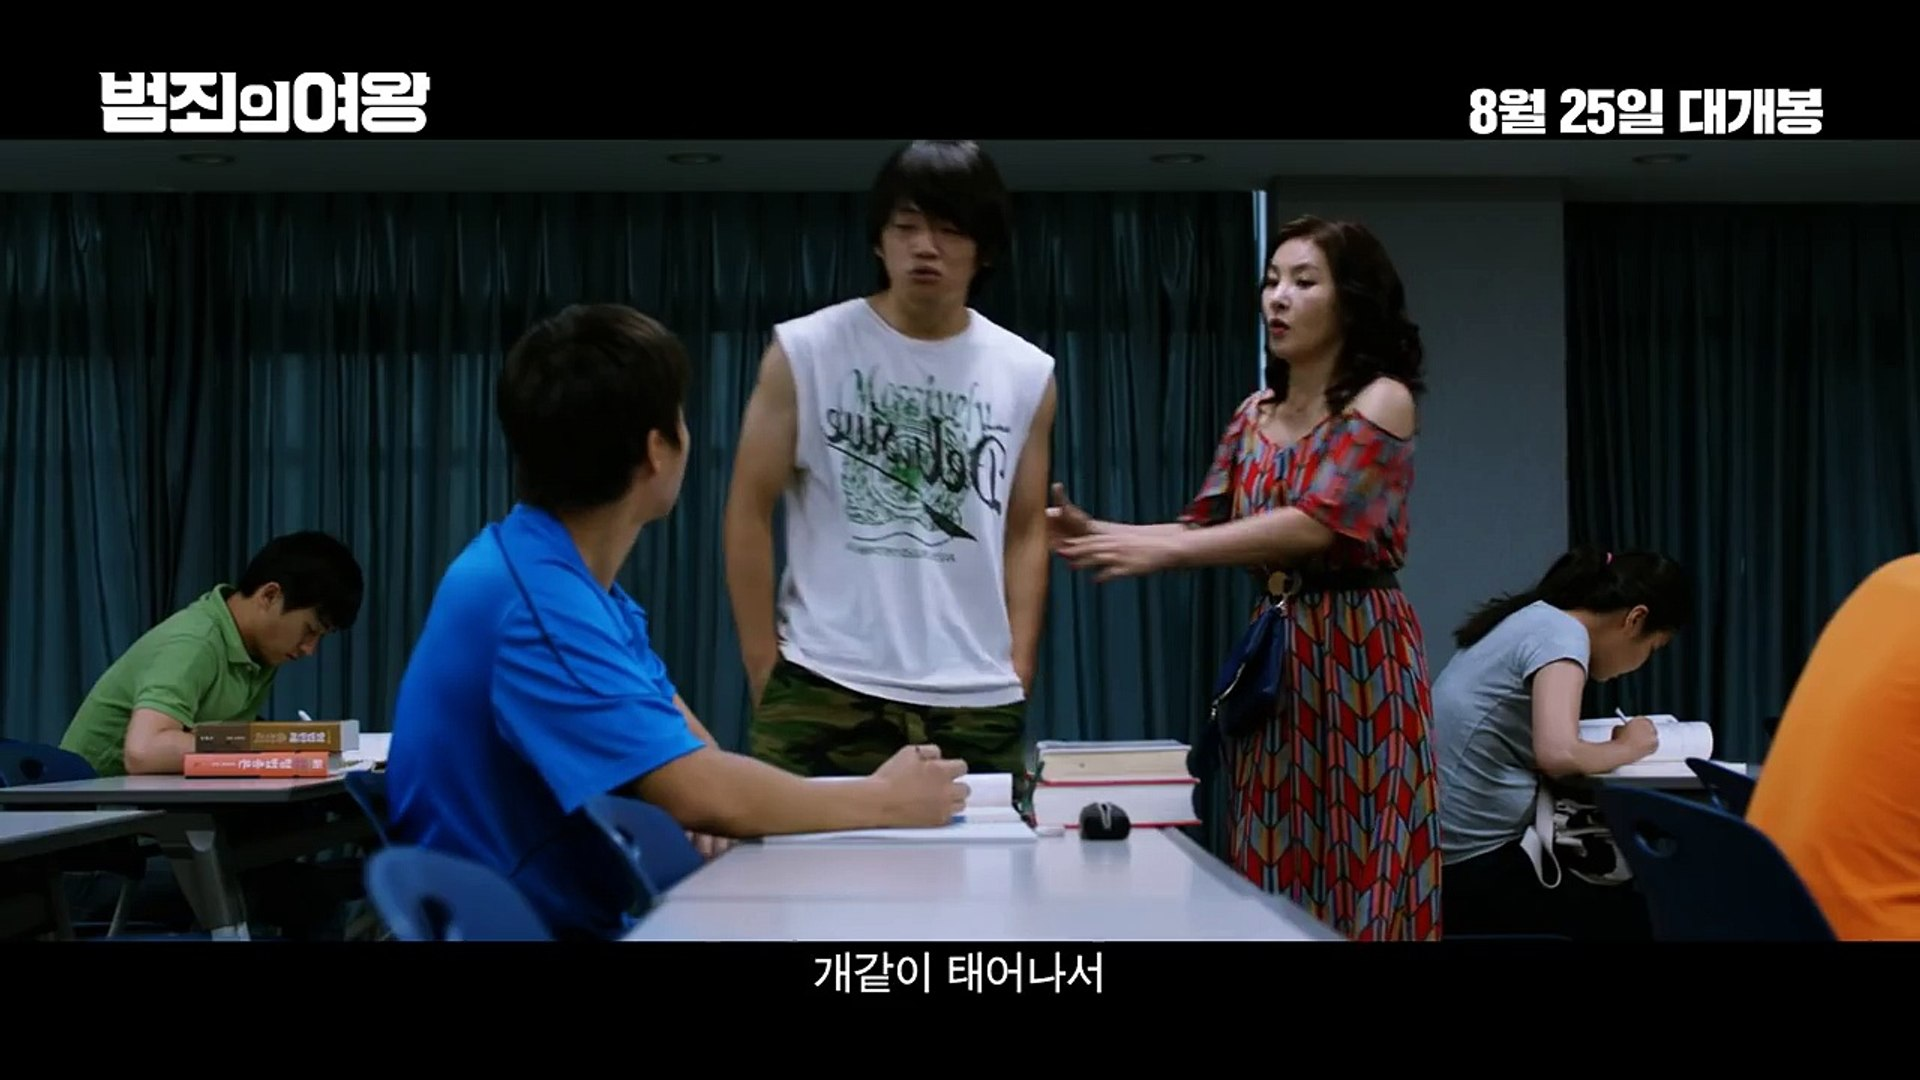 Korean Movie 범죄의 여왕 (The Queen of Crime, 2016) 예고편 (Trailer)